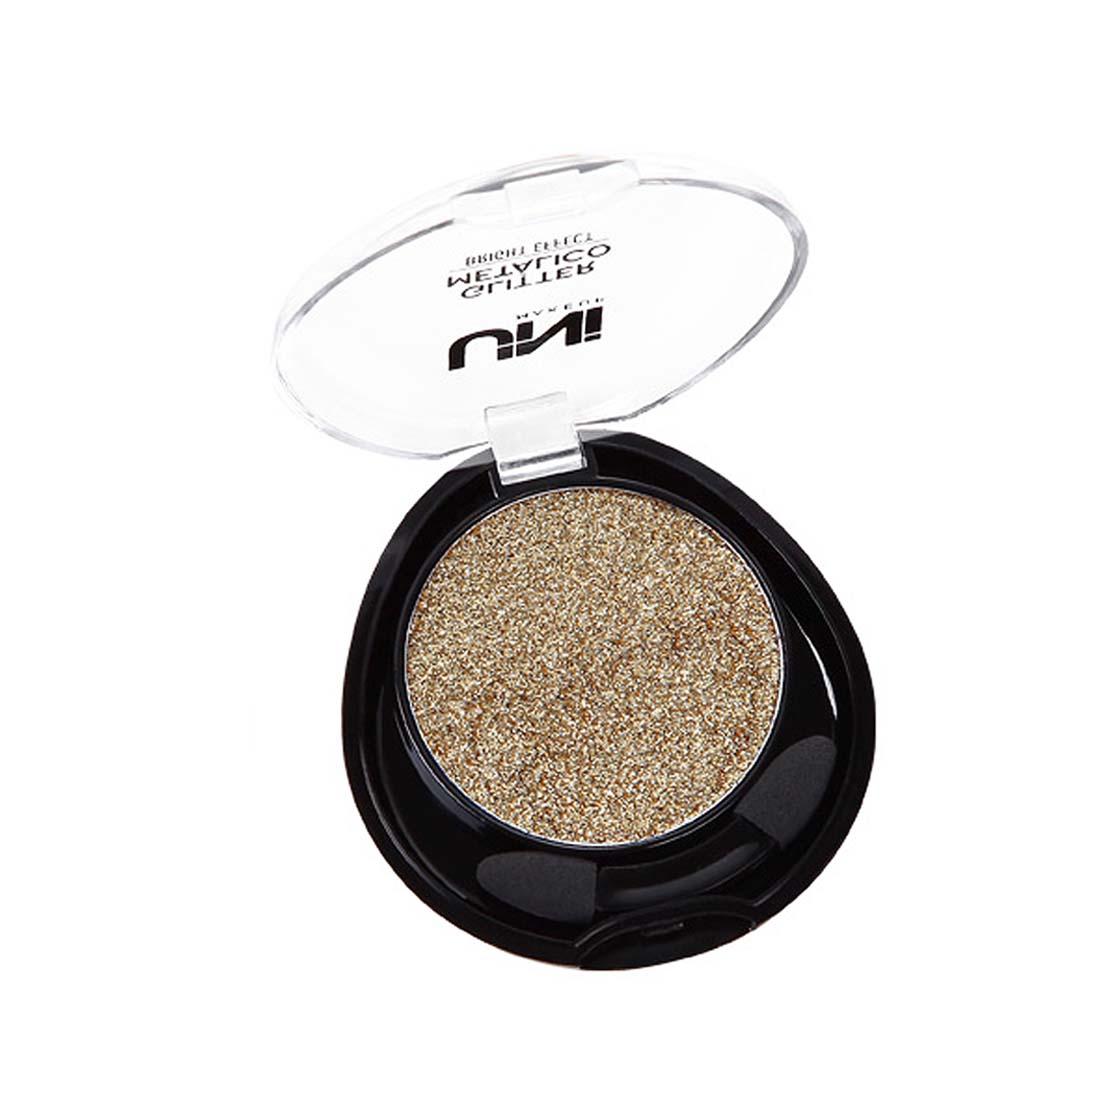 GLITTER METÁLICO BRIGHT EFFECT Uni Makeup-cor 03